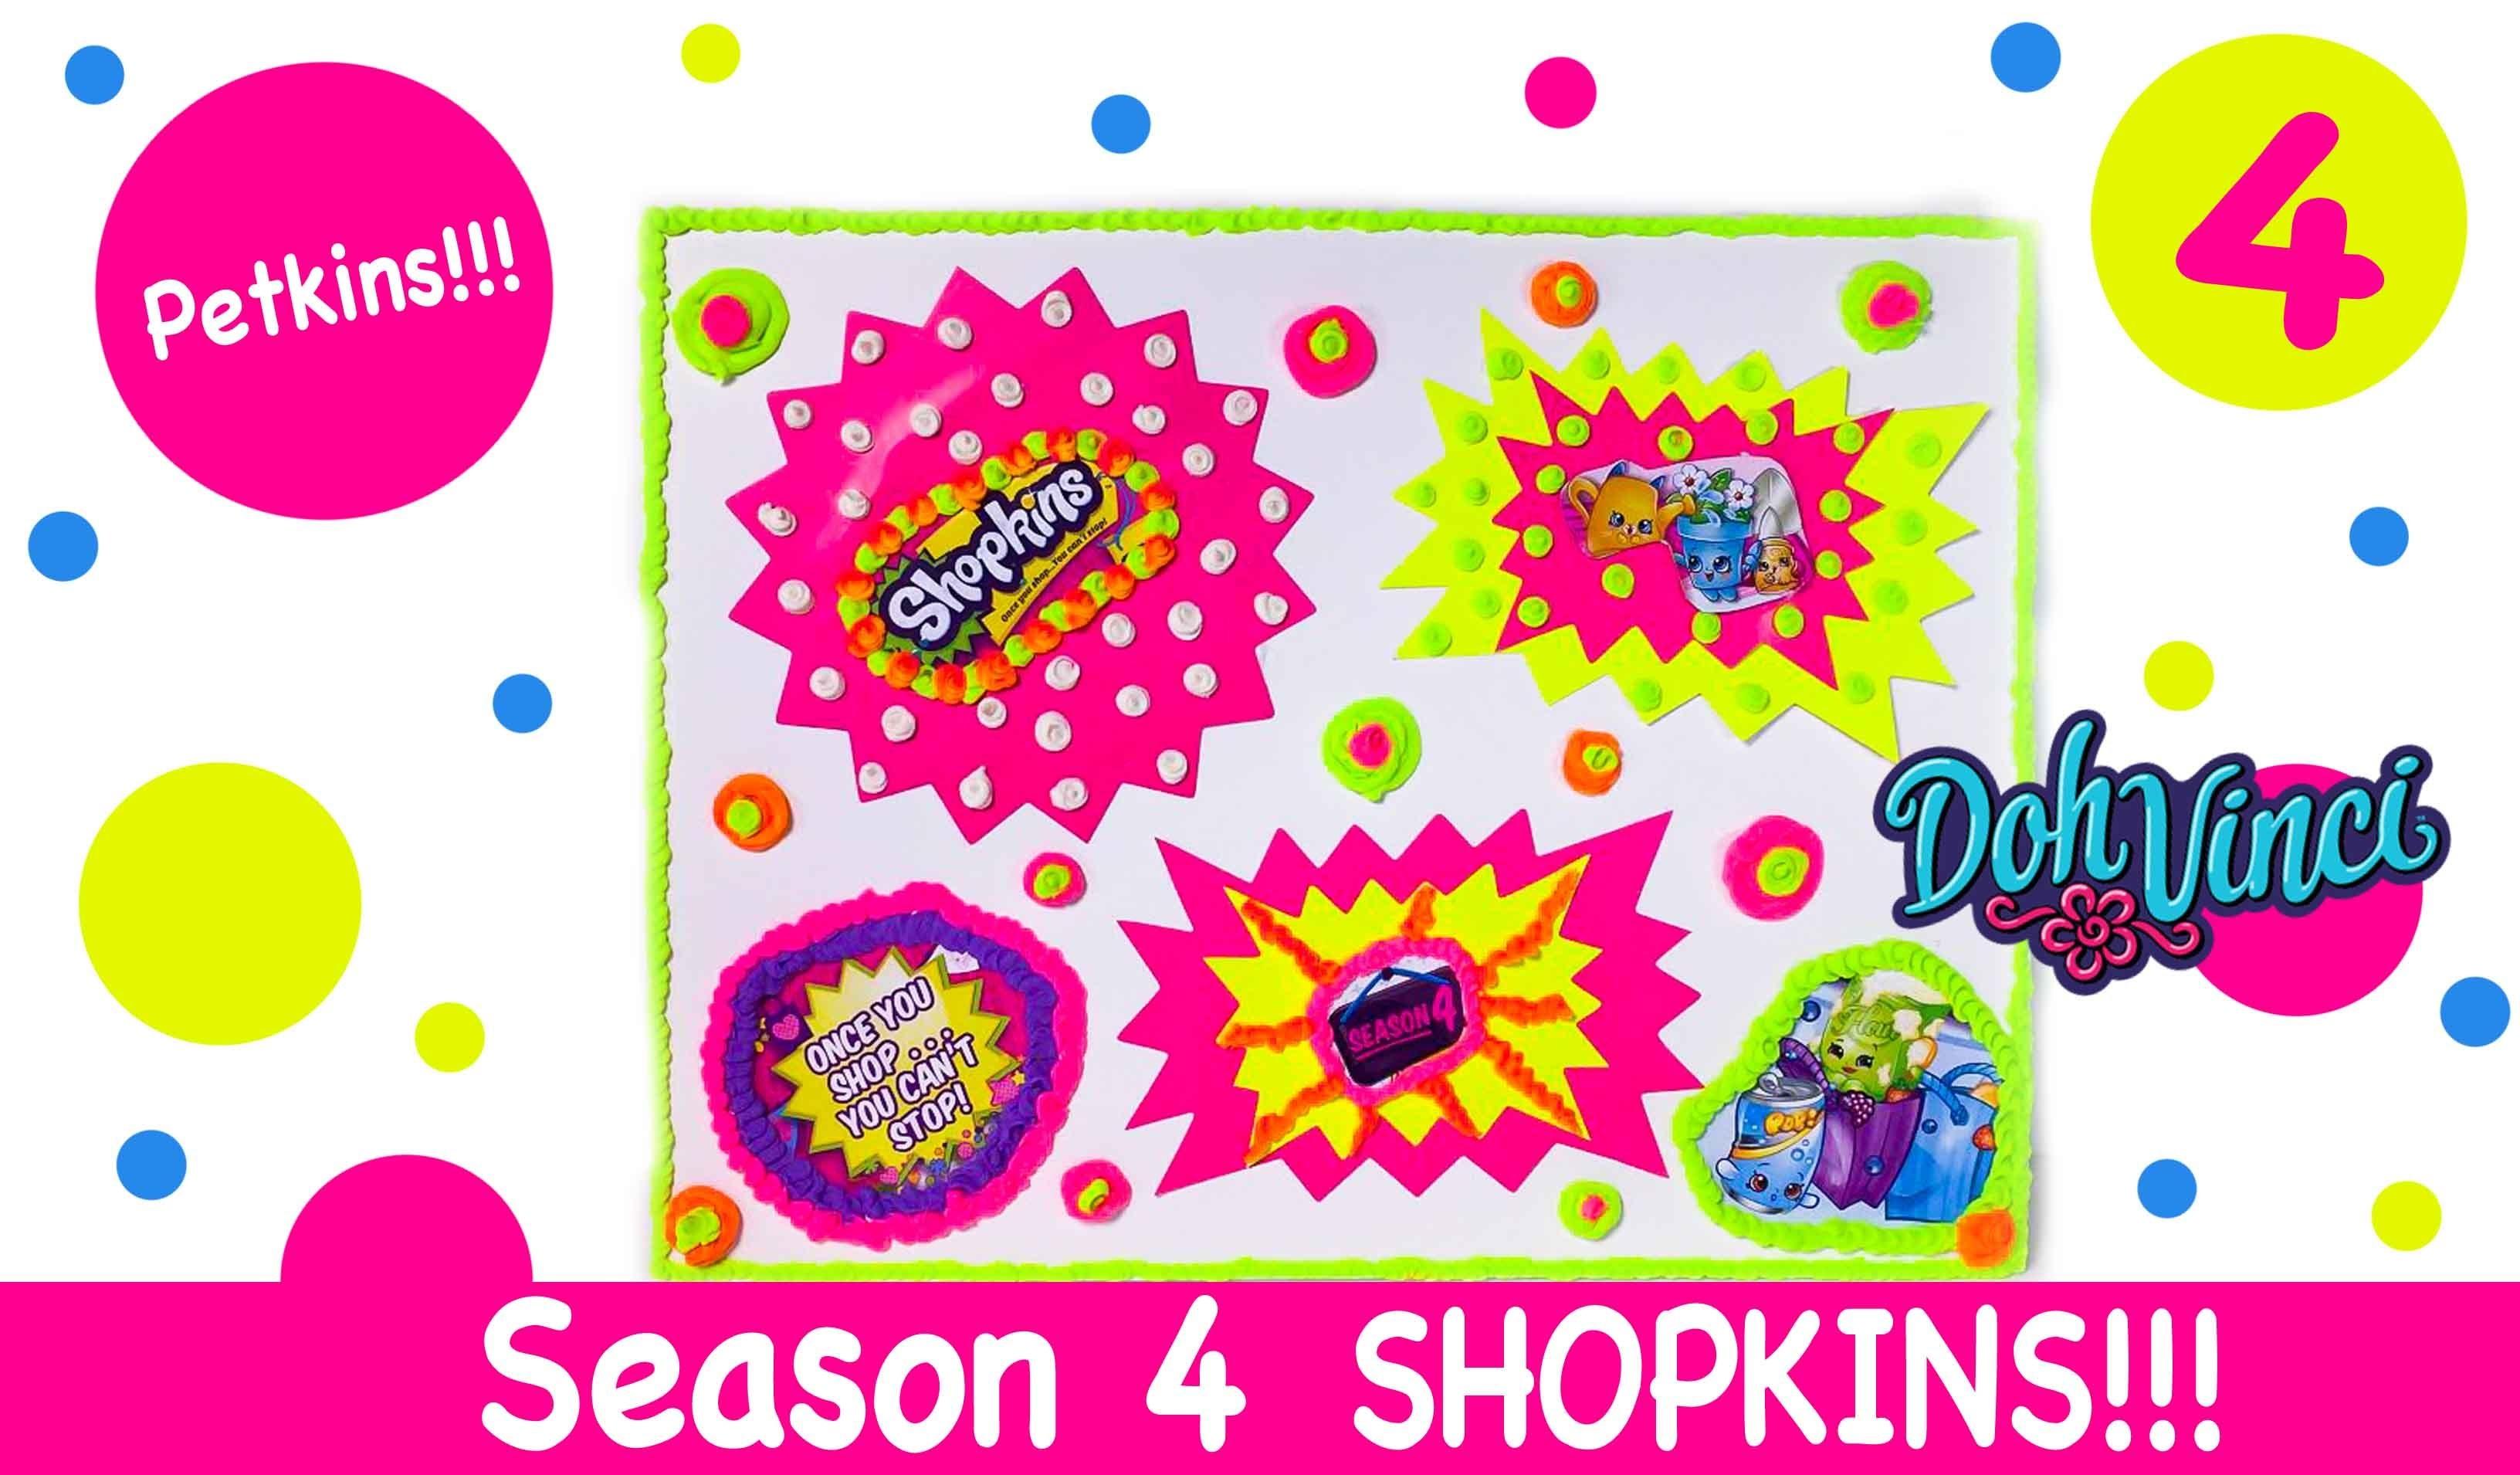 Shopkins Season 4 Unboxing - NEW Petkins  Plus DIY DohVinci Shopkins Poster - Play Doh Art Craft